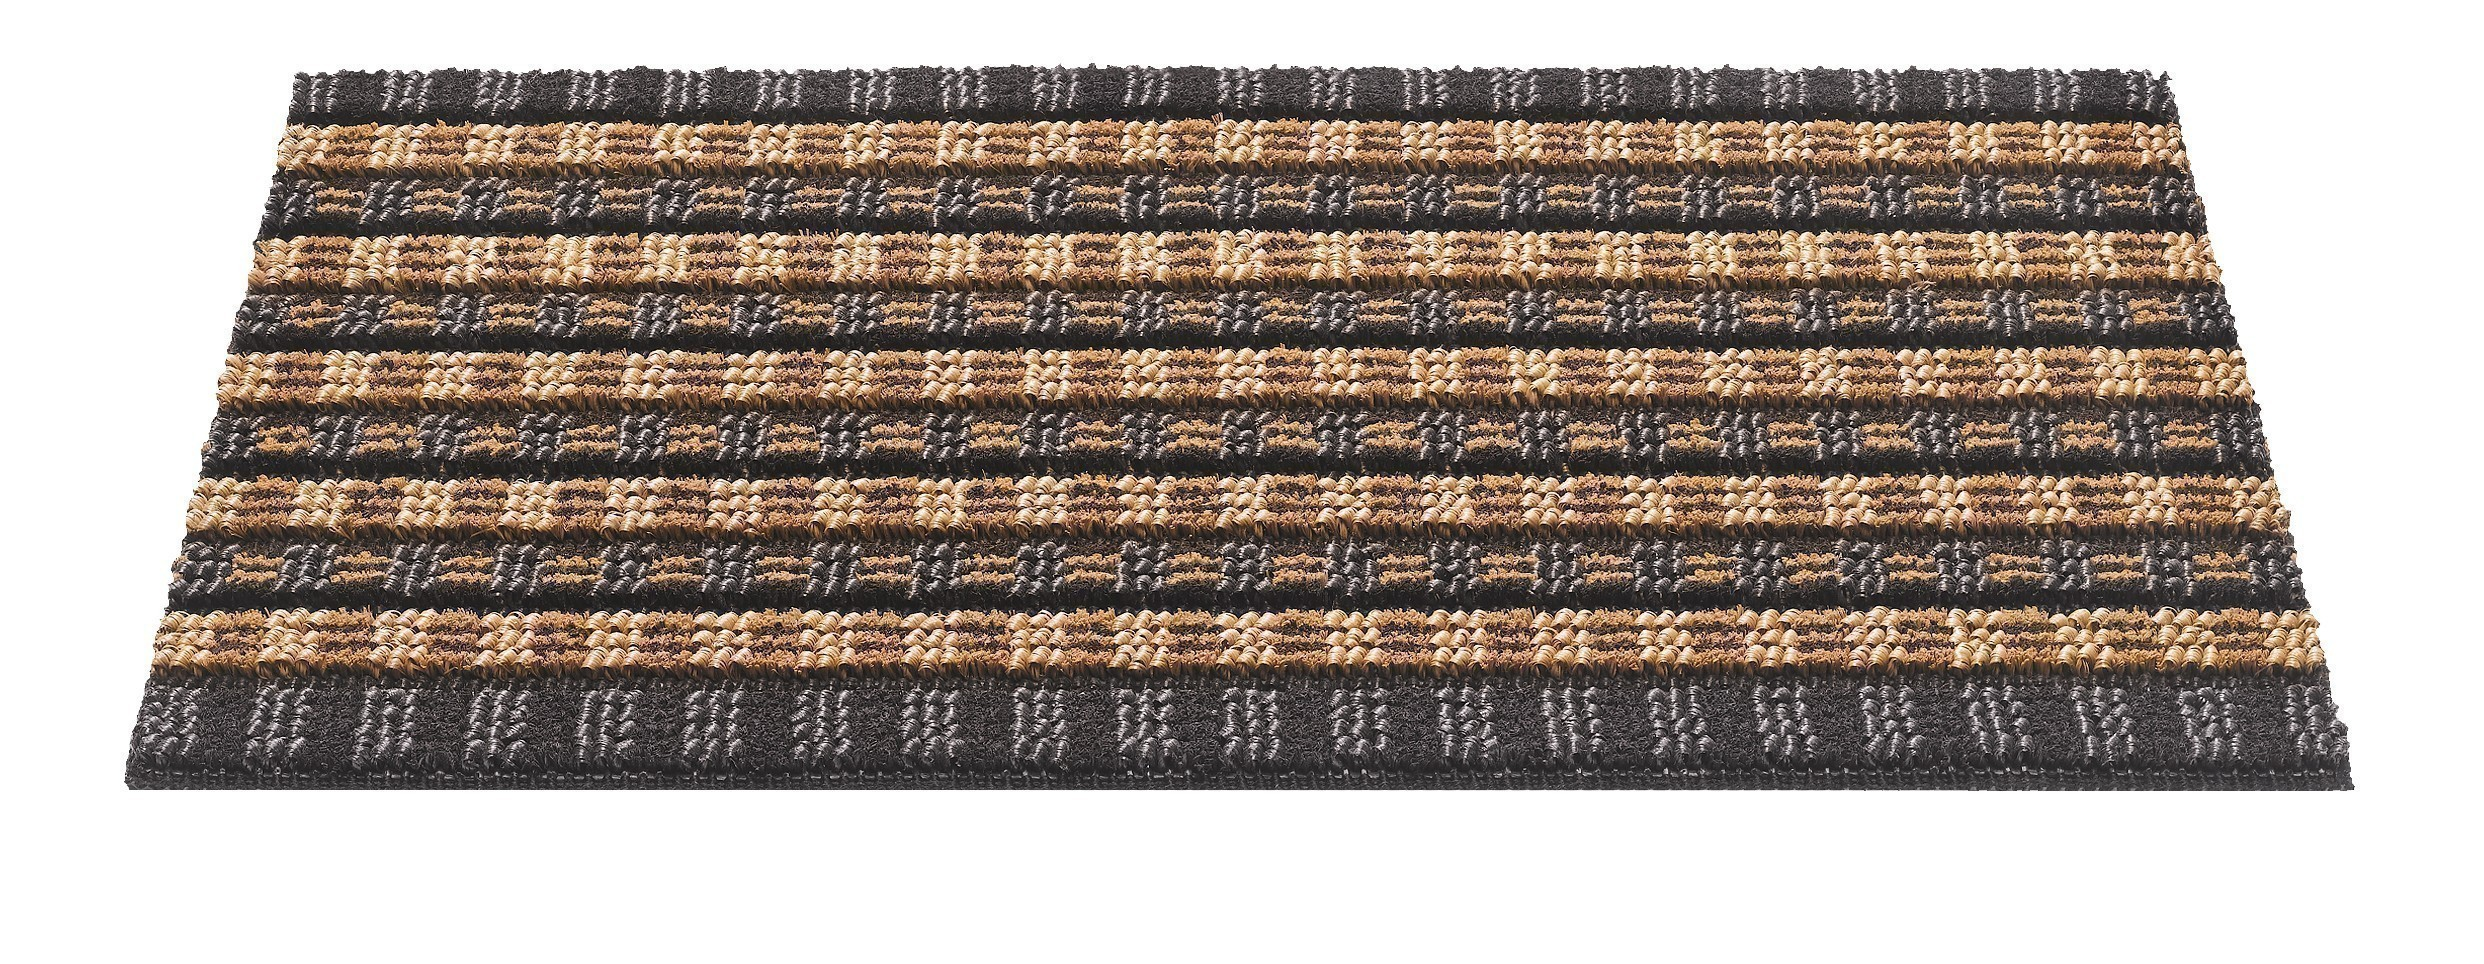 Hamat Fußmatte / Außenmatte Quadro Scrape 50x80cm natural Bild 1